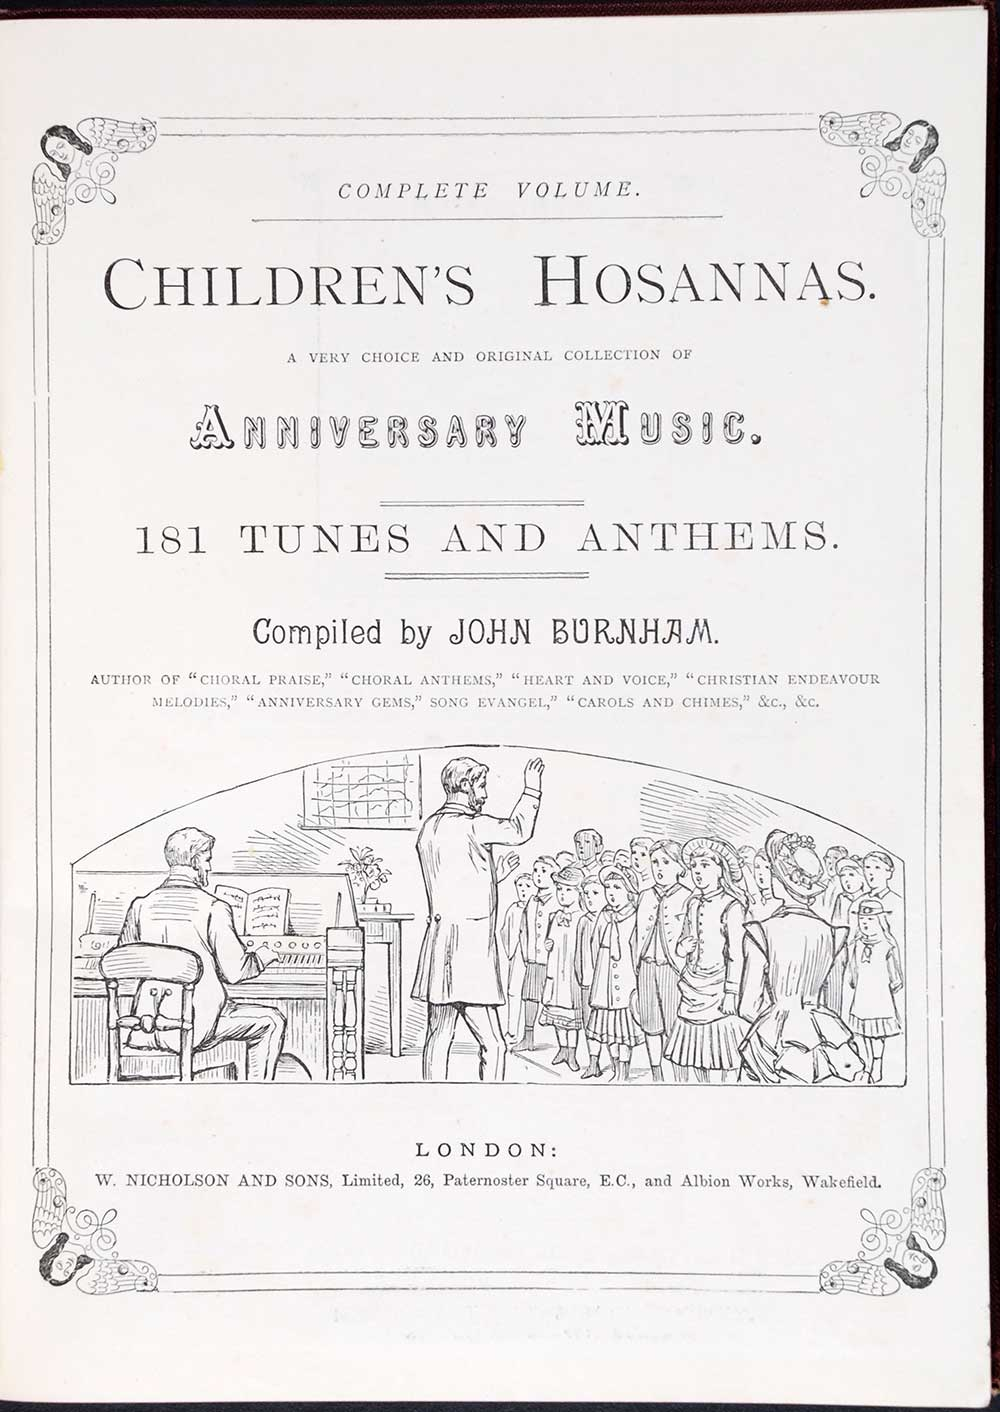 John Burnham (editor). <em>Children's hosannas: a very choice and original collection of anniversary music.</em> London: W. Nicholson, [1889?]